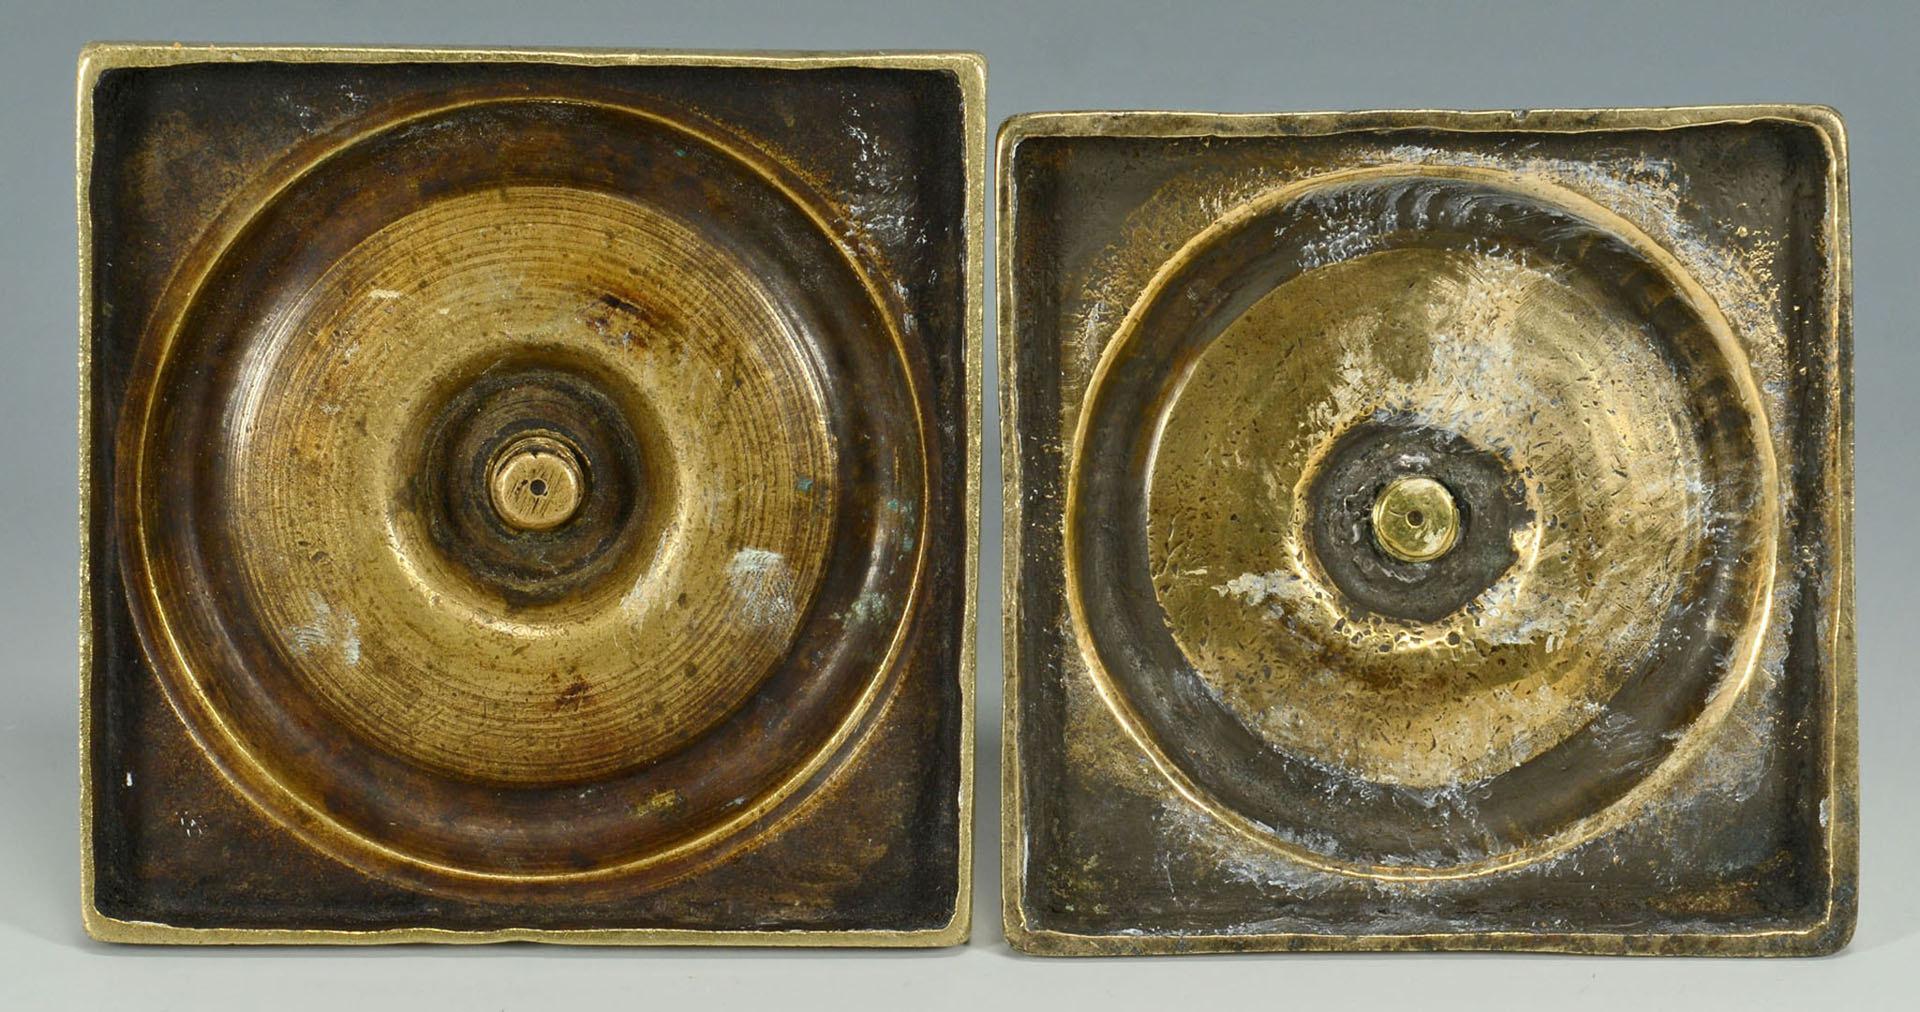 Lot 94: Four English Brass Candlesticks